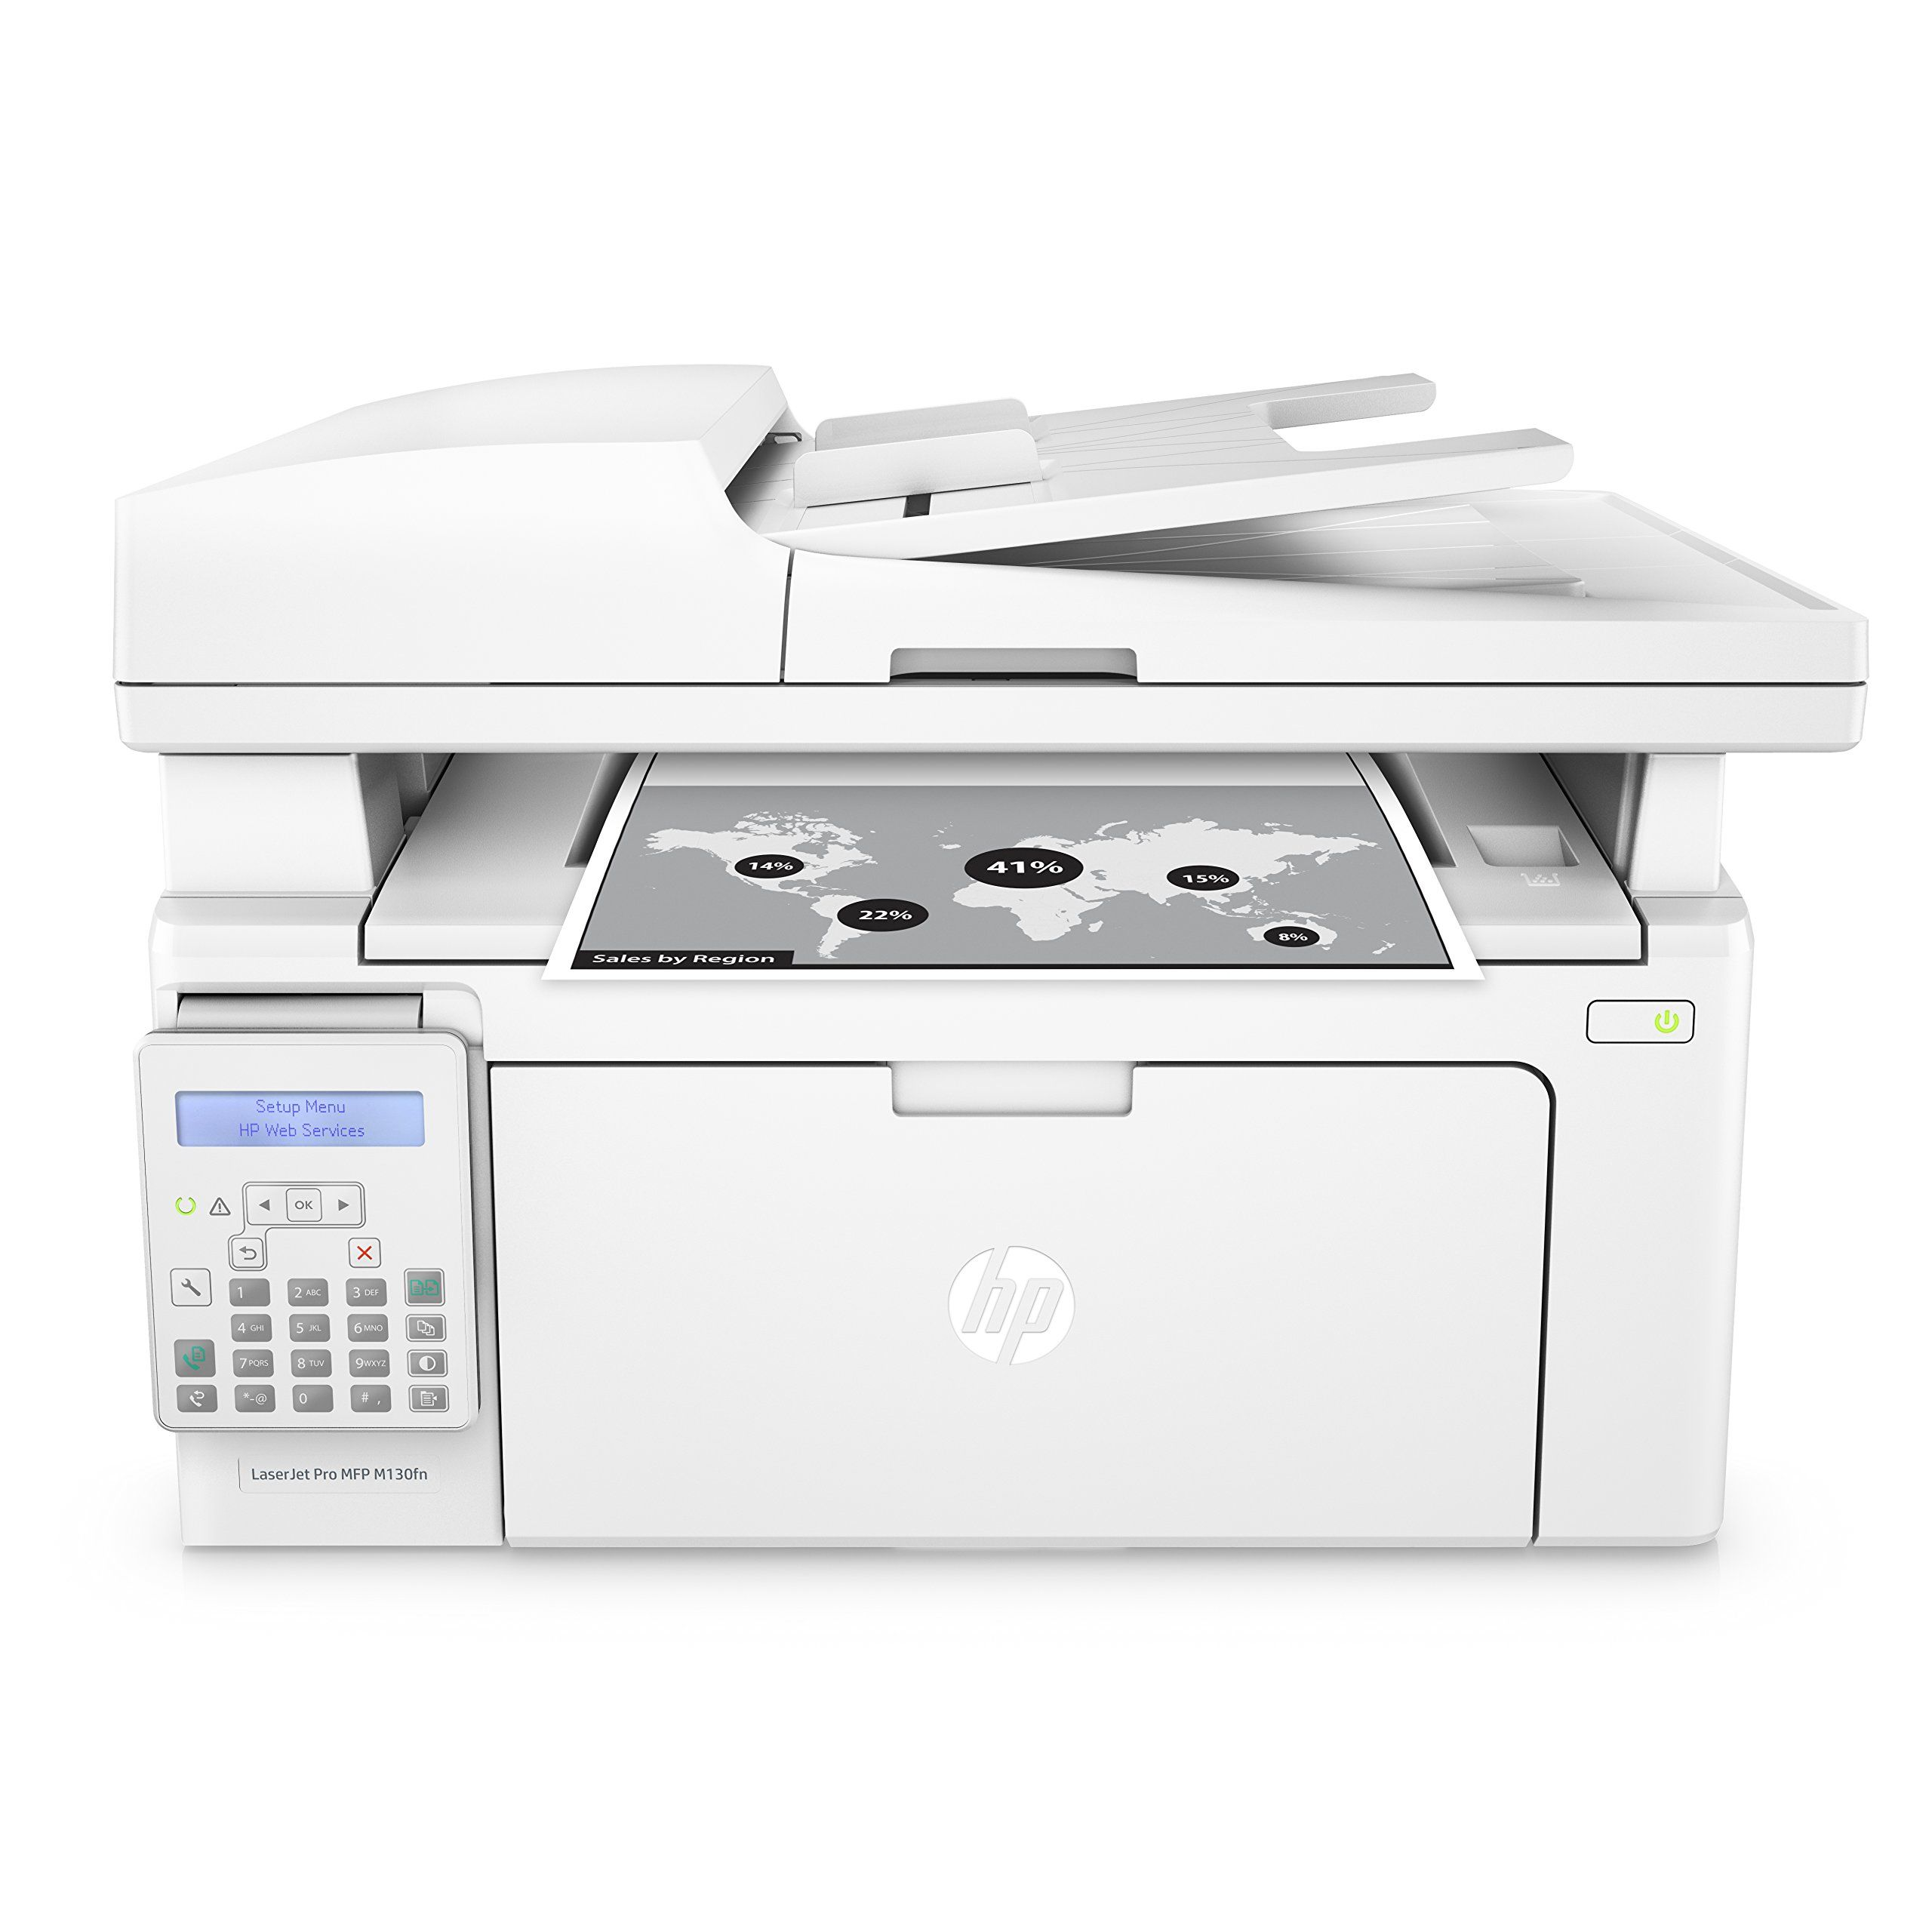 Hp Laserjet Pro M130fn Allinone Laser Printer With Print Security Amazon Dash Replenishment Ready G3q59a Replaces Multifunction Printer Laser Printer Printer